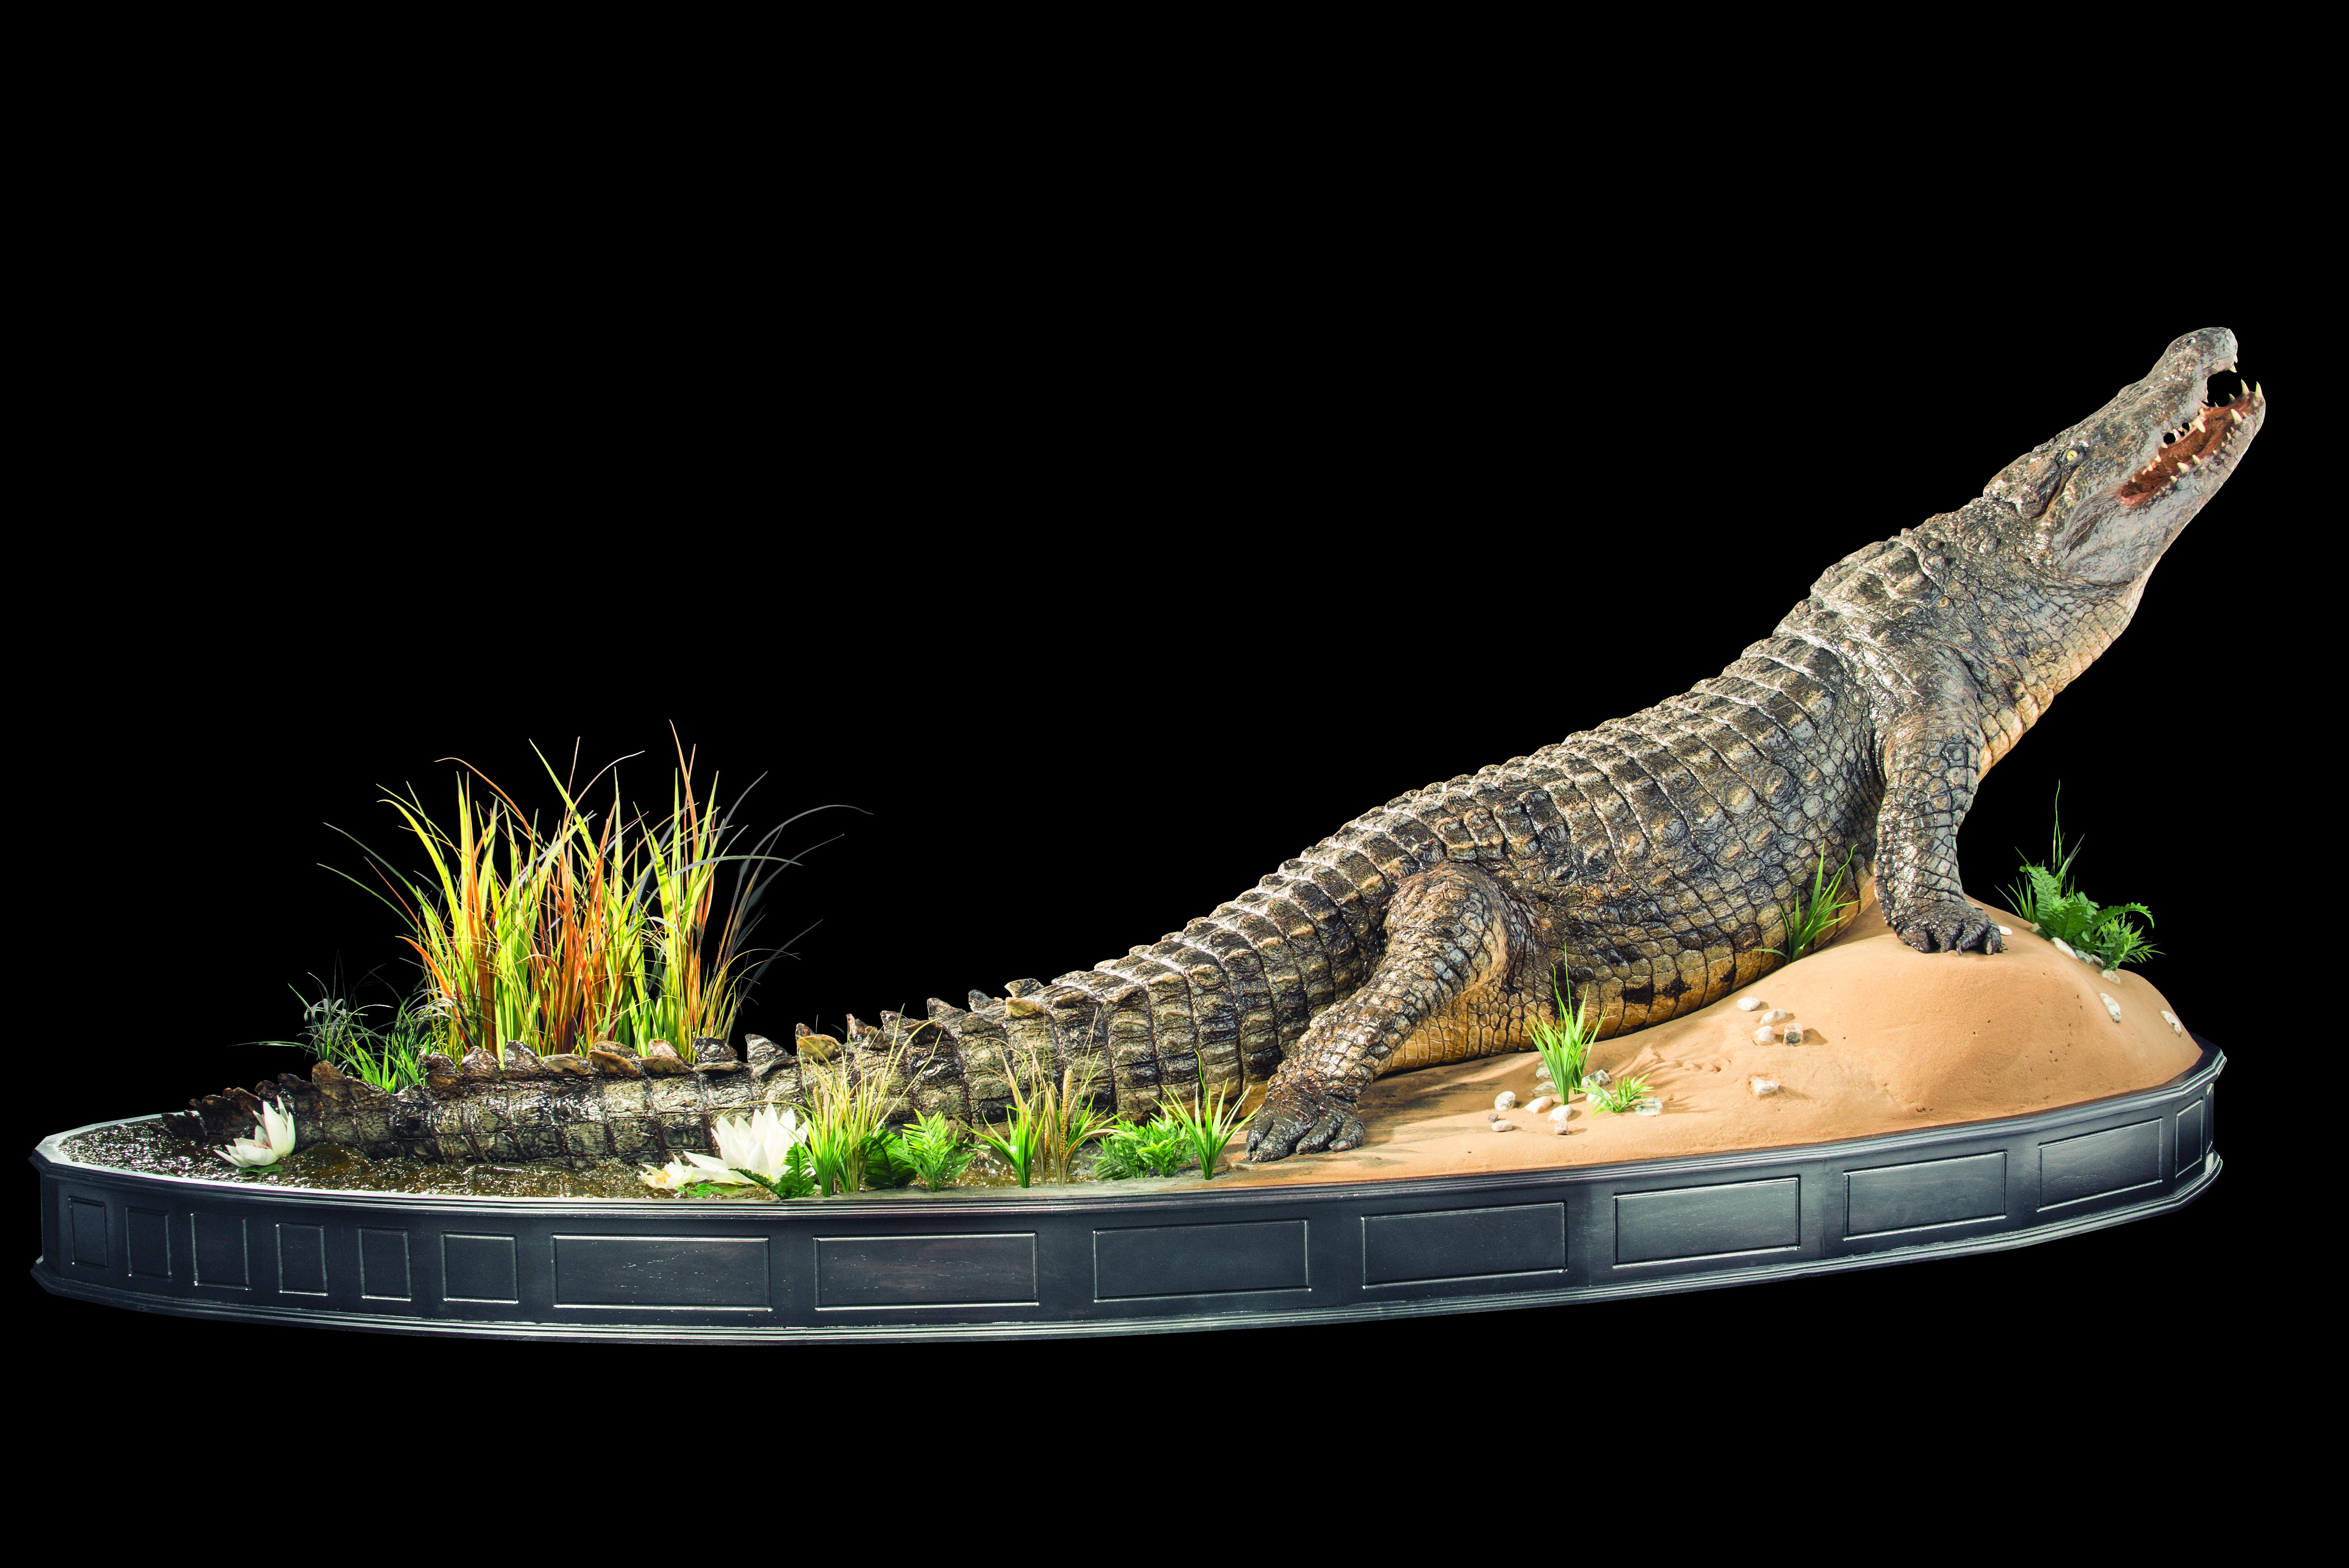 croc-fullmount-ff015-jpg.420882